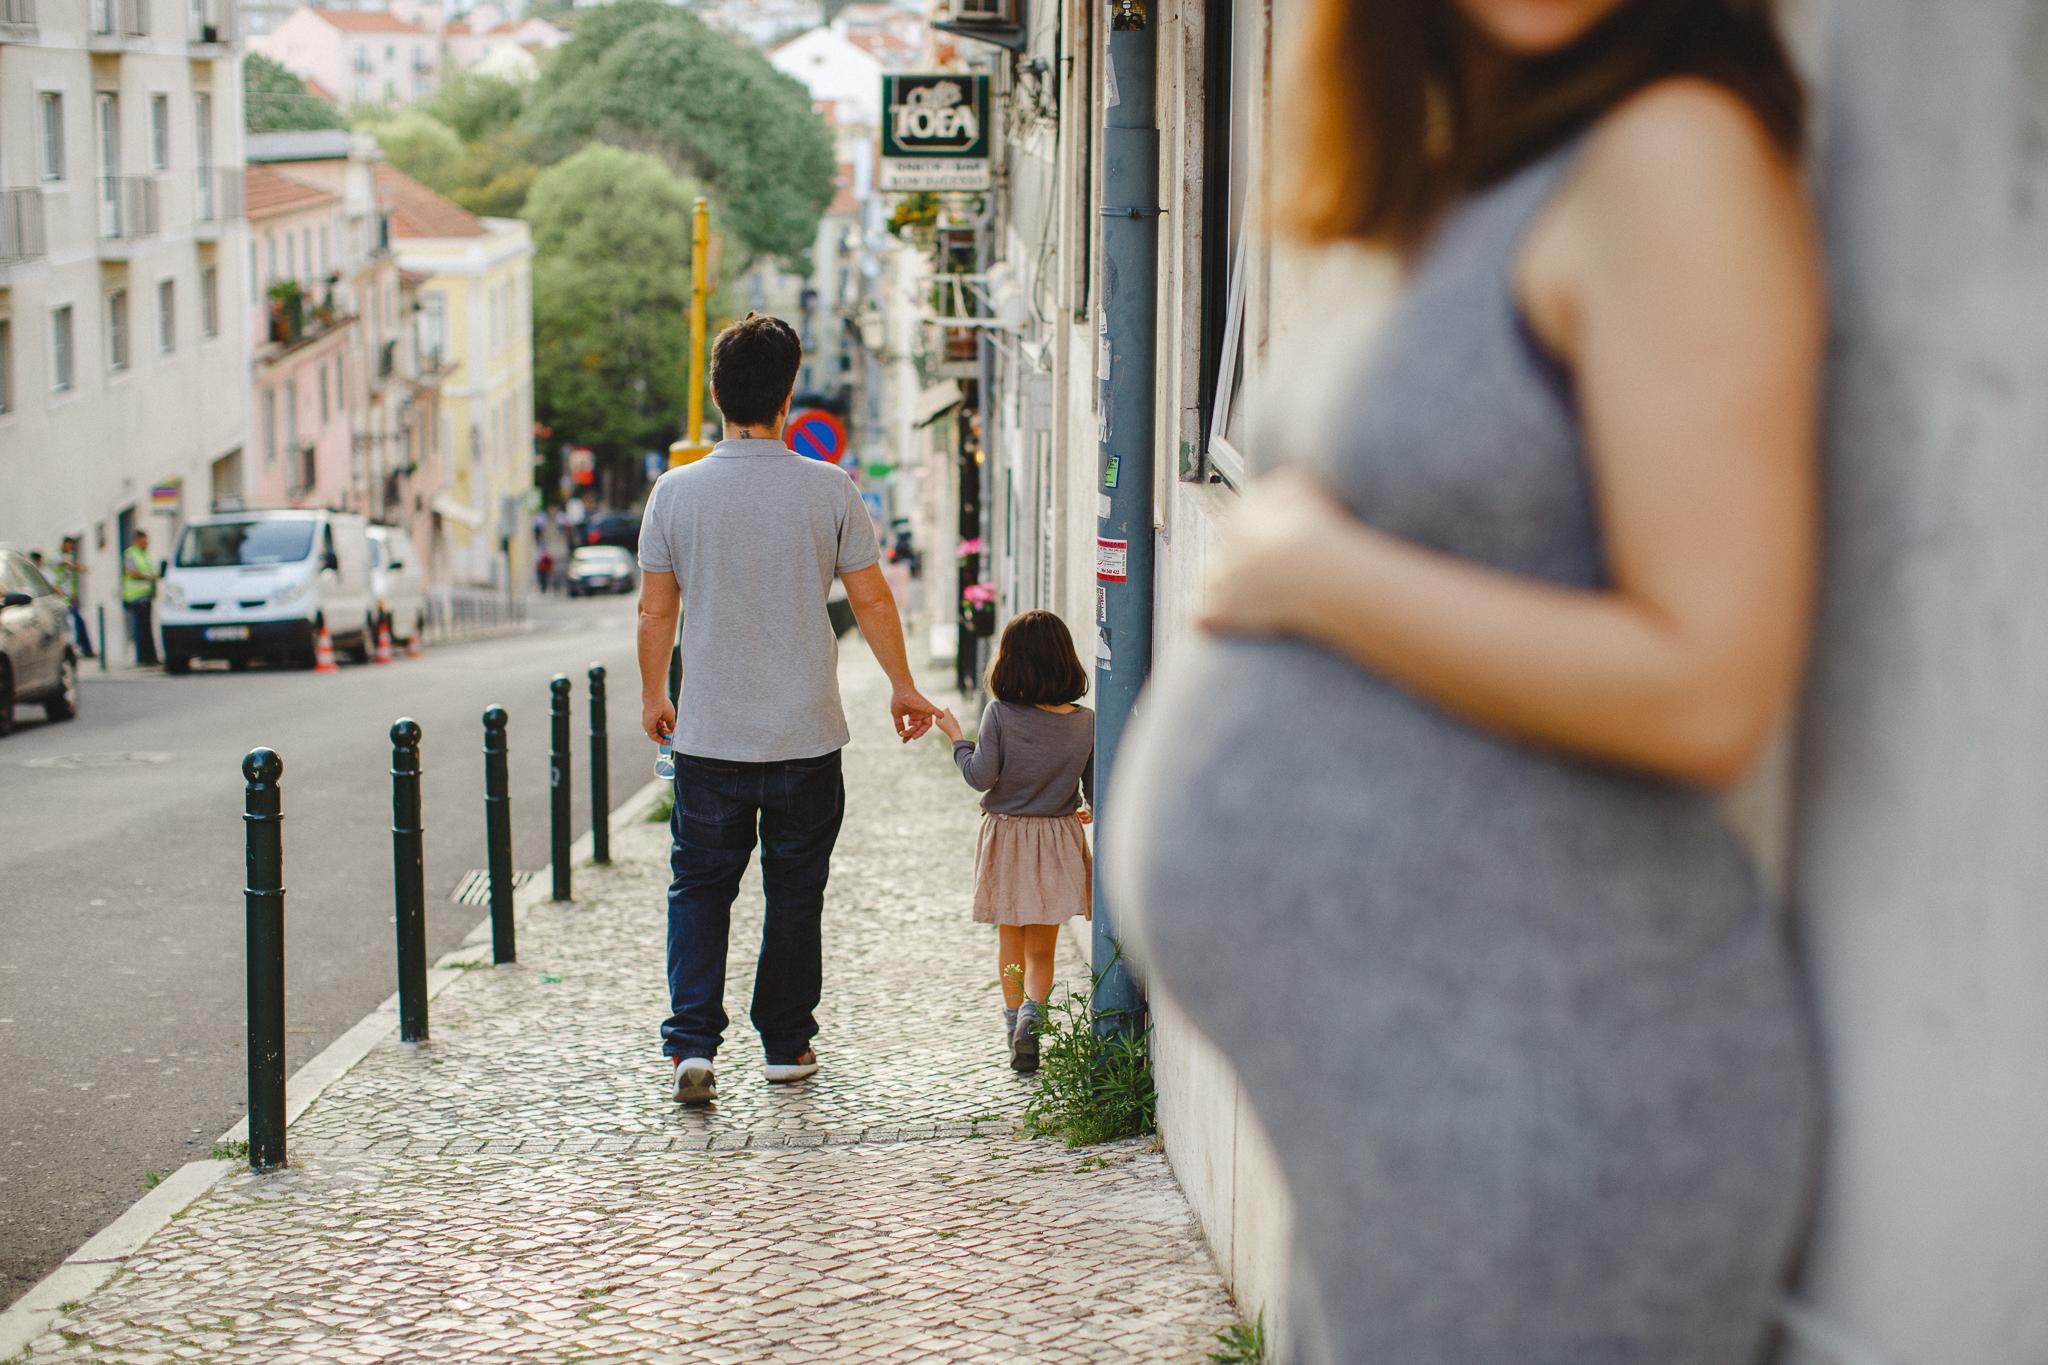 Sessão de Família e Gravidez em Lisboa por Hello Twiggs * Maternity Photo Shoot in Lisbon by Hello Twiggs